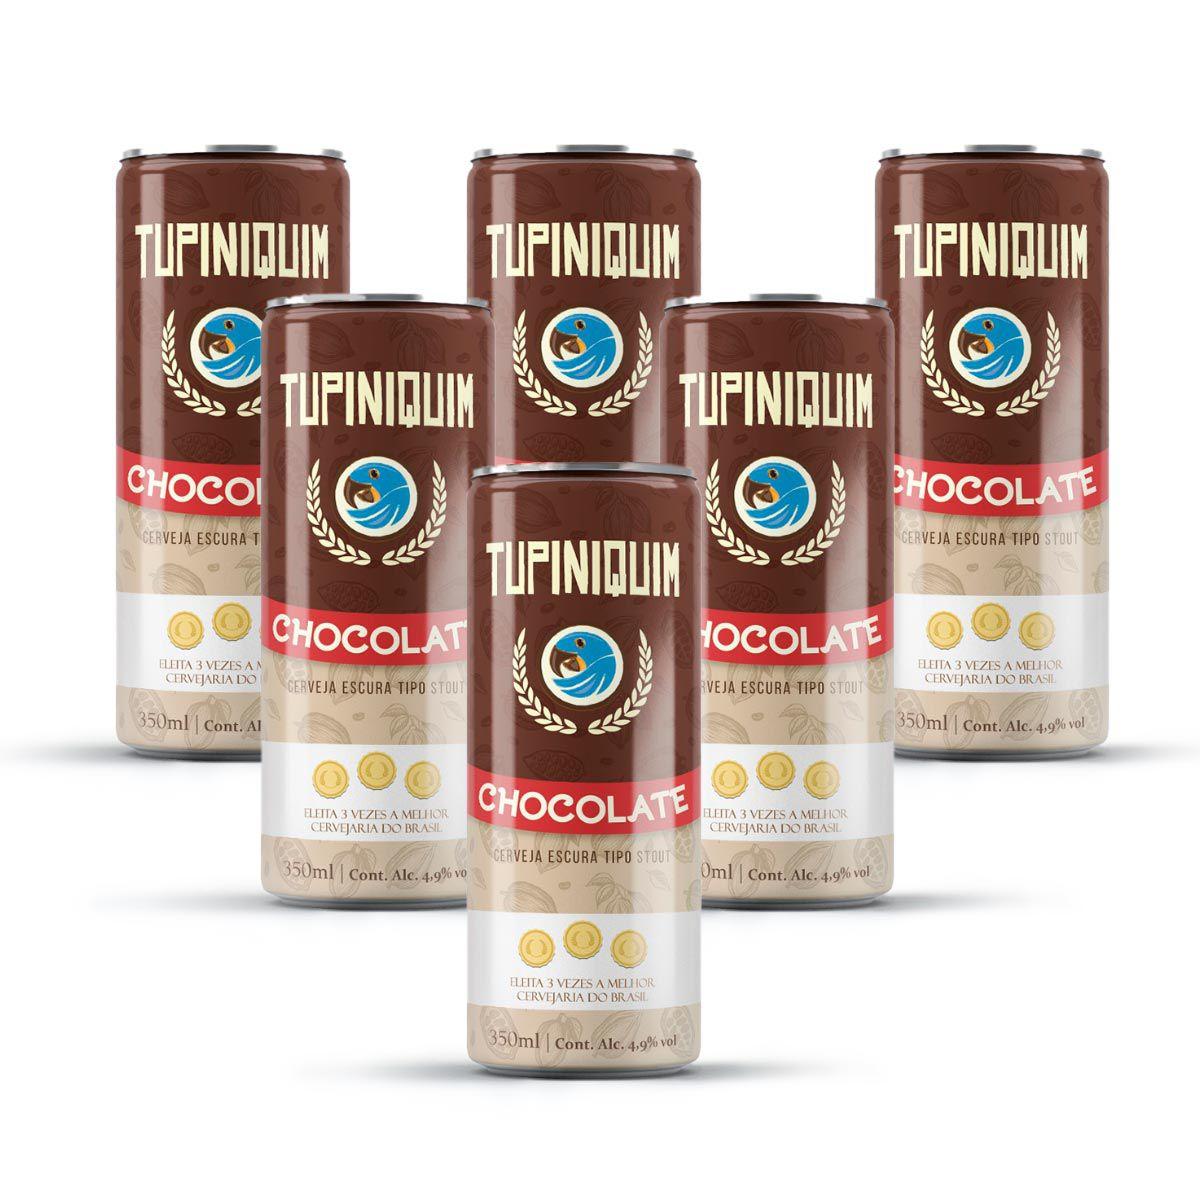 Pack Tupiniquim Chocolate Stout 6 latas 350ml